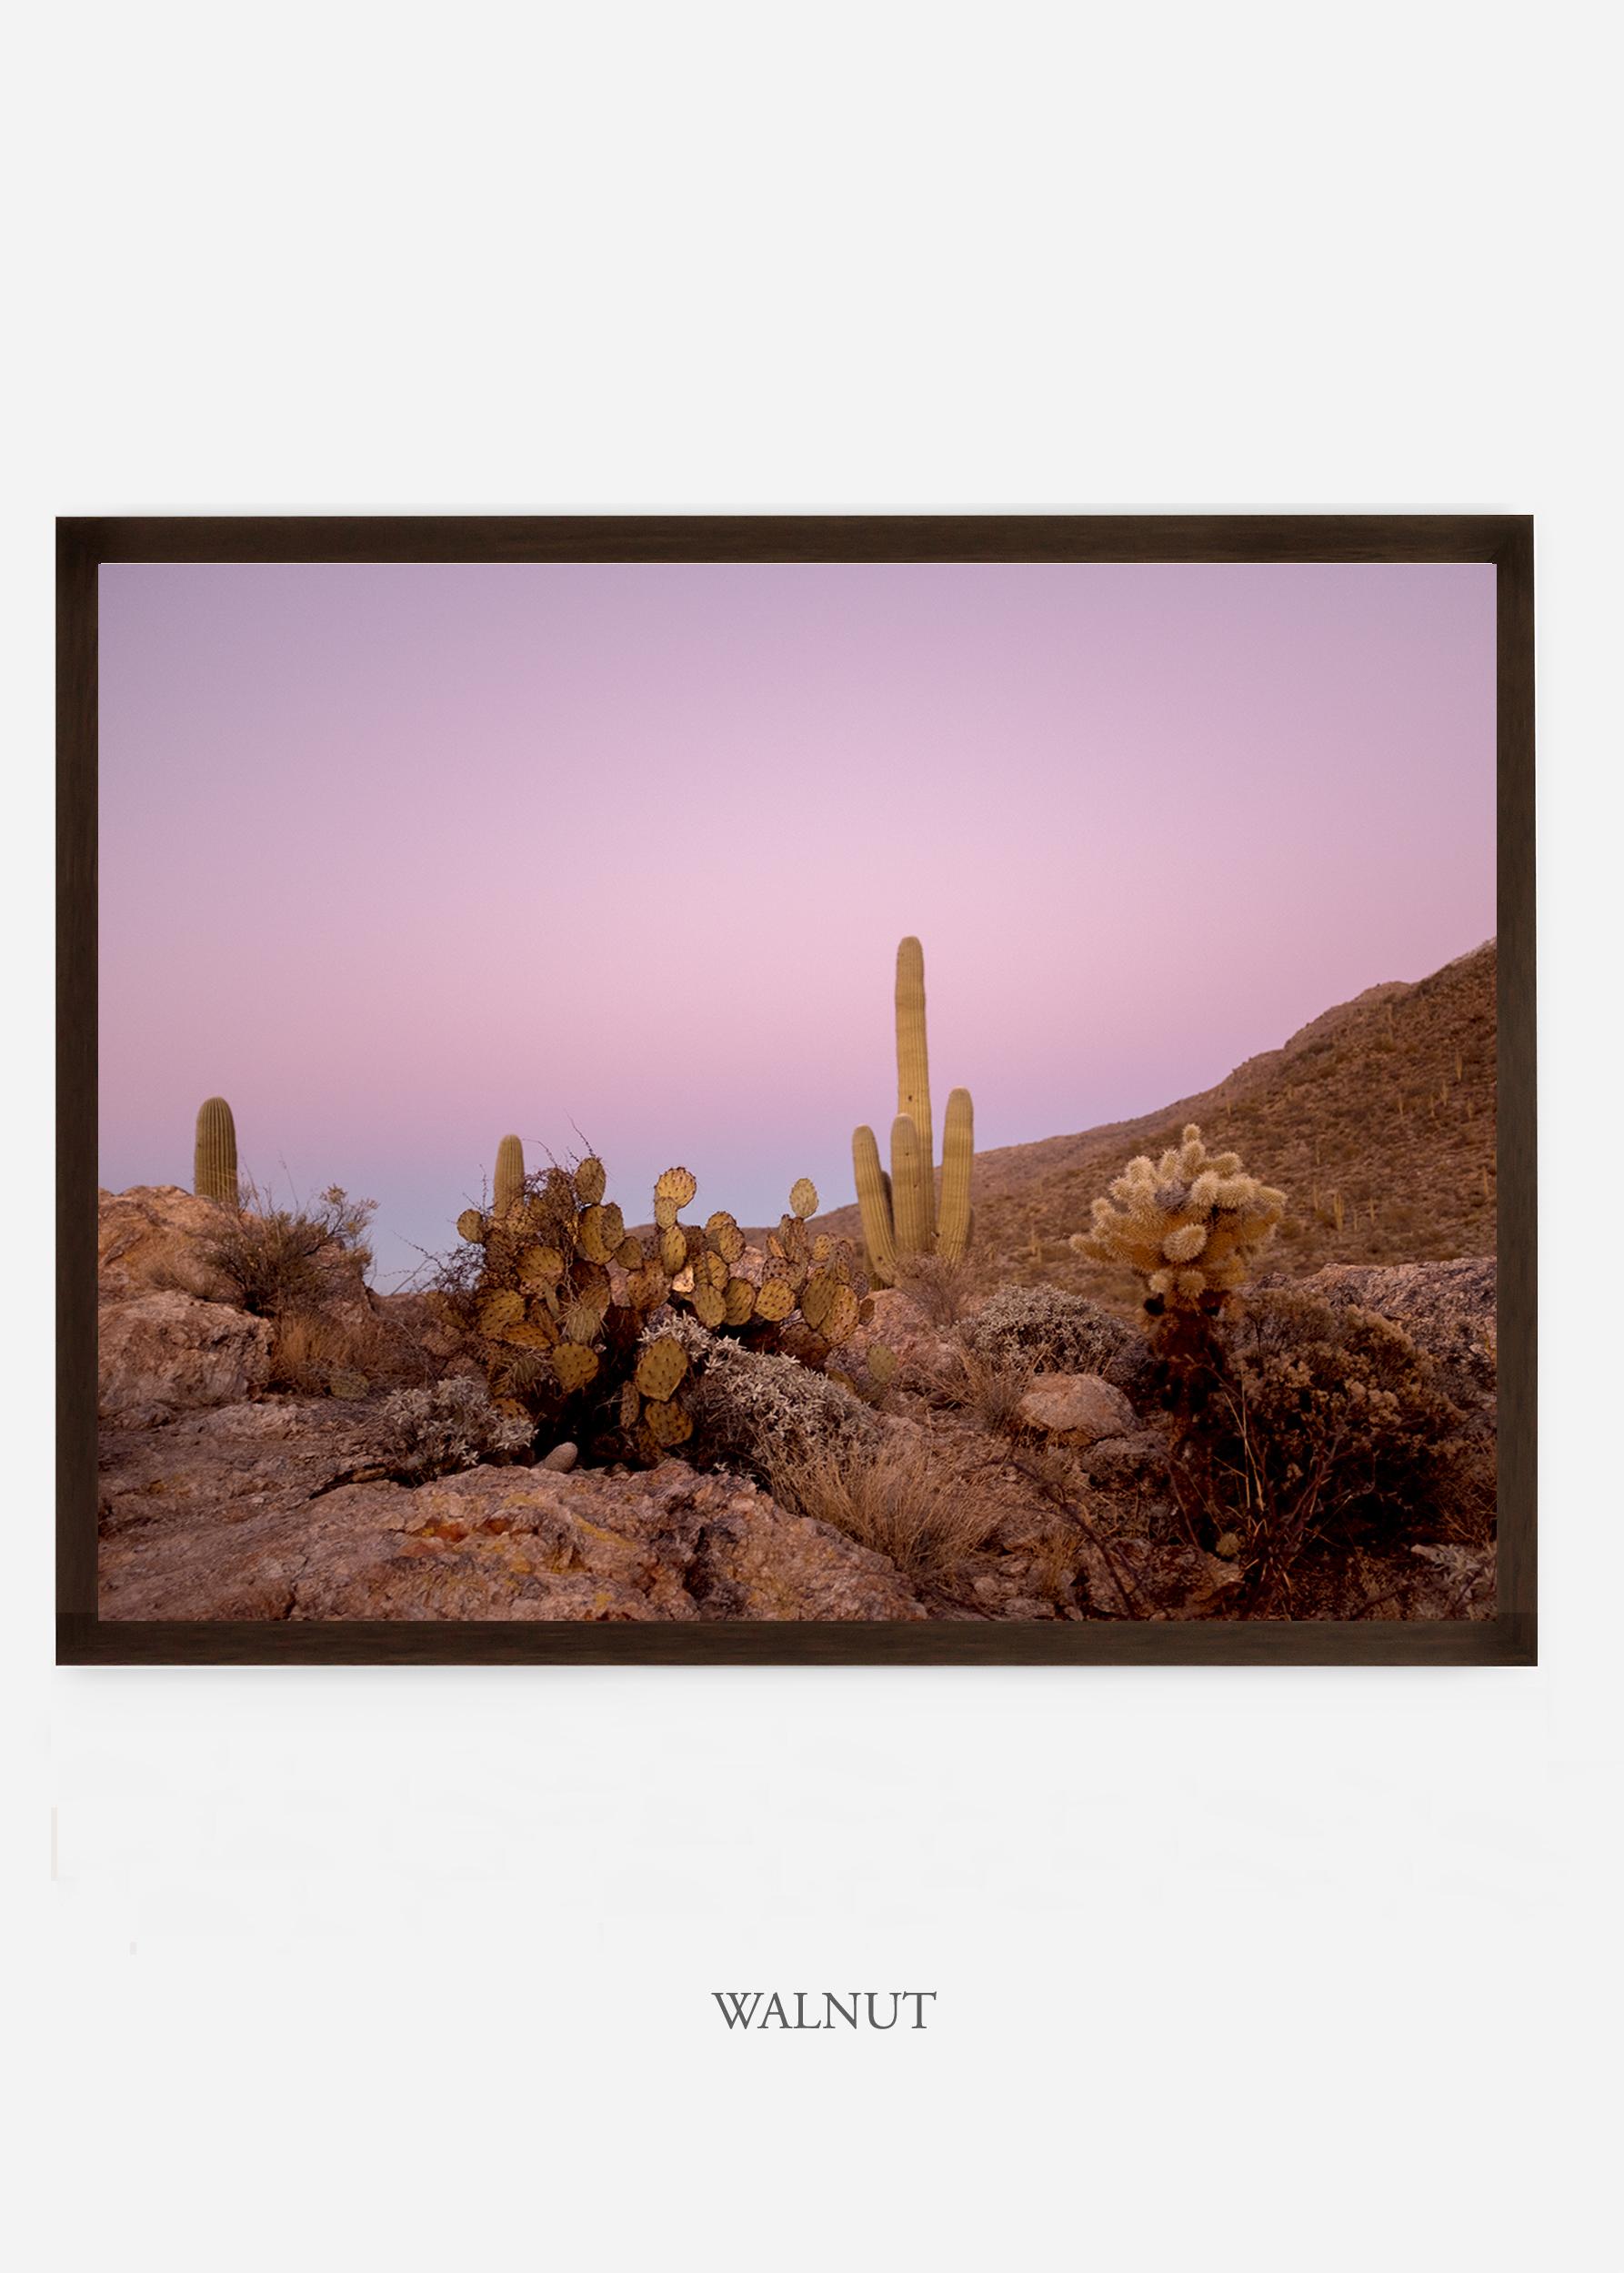 nomat_walnutframe-saguaroNo.9-wildercalifornia-art-wallart-cactusprint-homedecor-prints-arizona-botanical-artwork-interiordesign.jpg